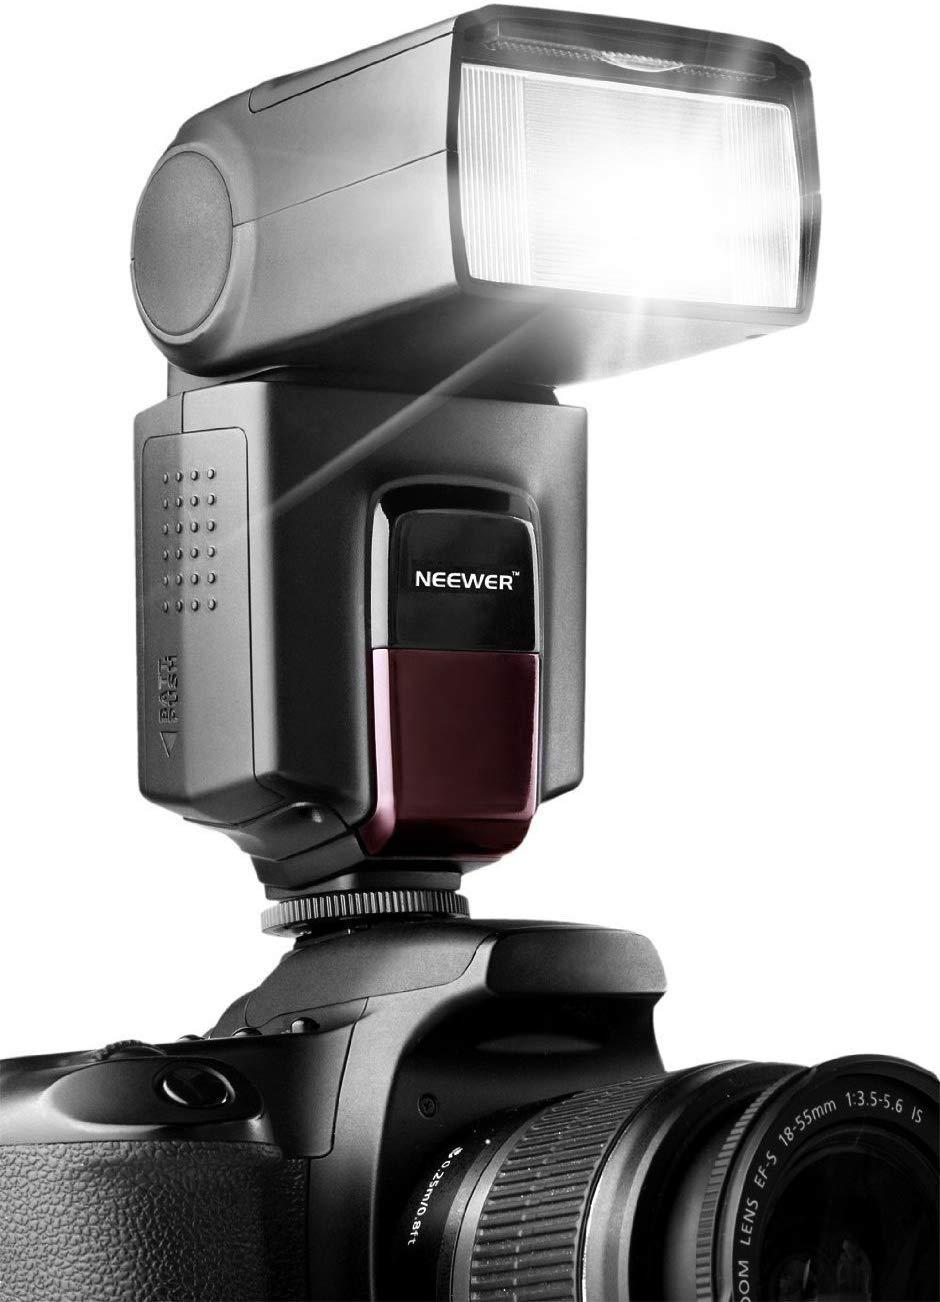 Neewer TT560 Flash Speedlite for £15.39 delivered (using code) @ Amazon / Logicam UK